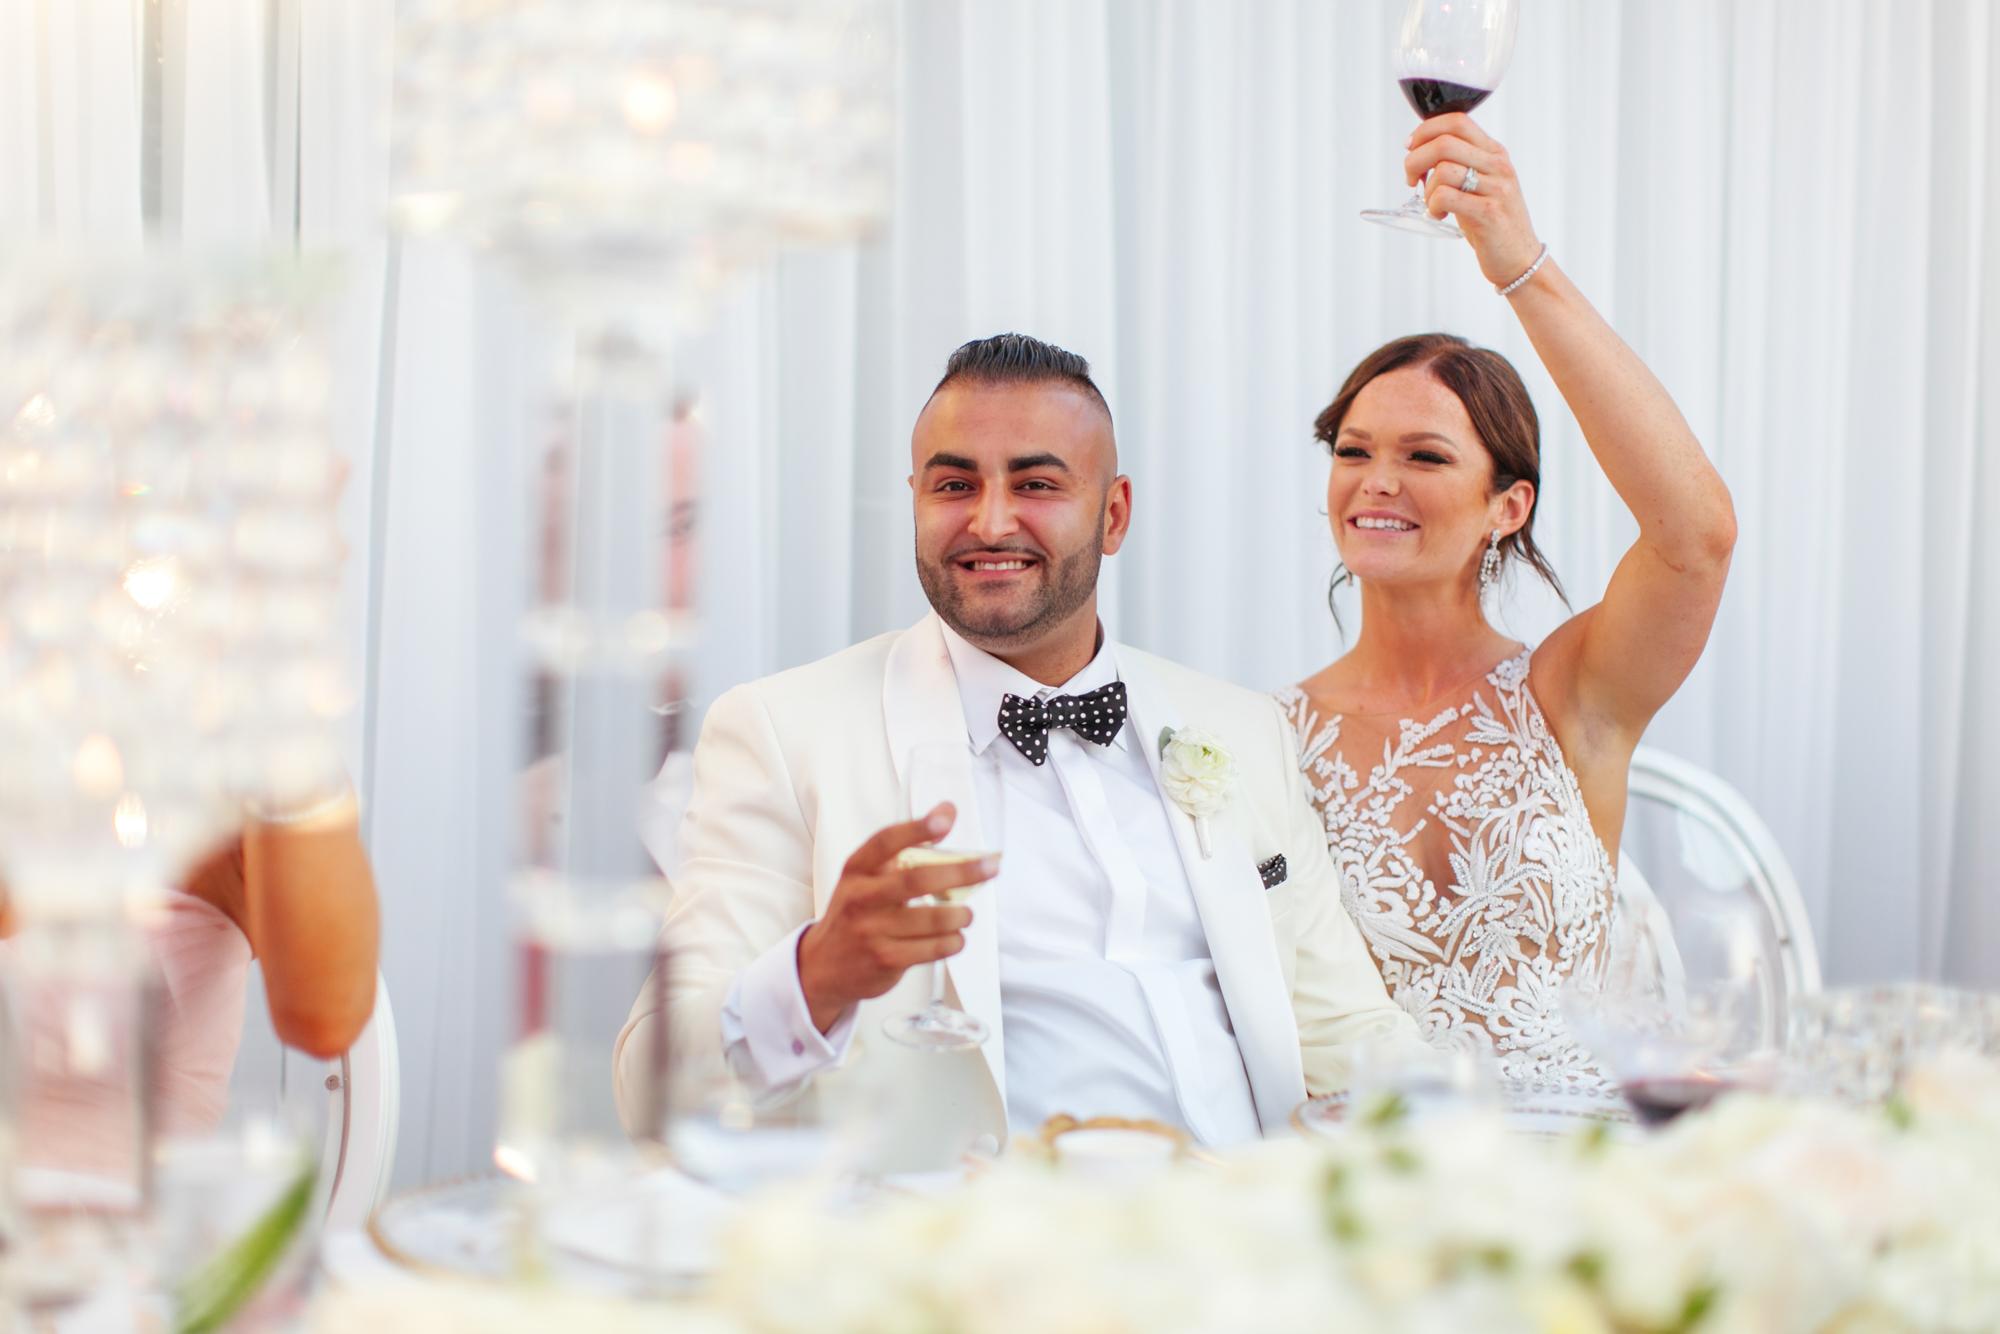 vancouver-luxury-wedding-photographer-lori-miles--21.jpg